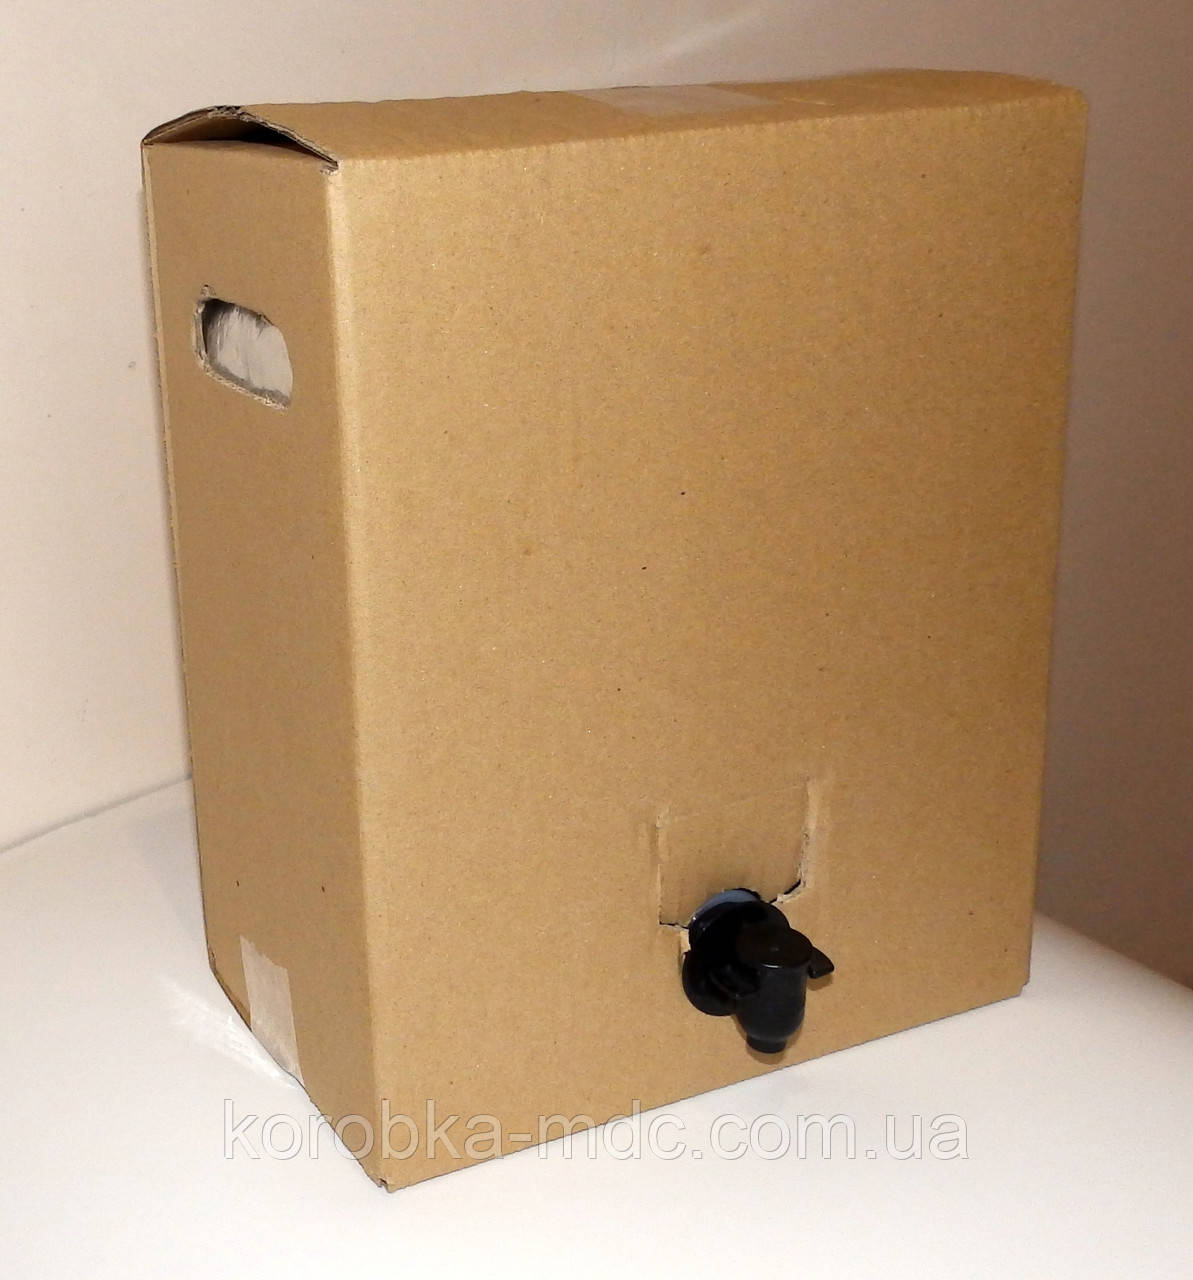 Коробка с пакетом 10 литров без печати